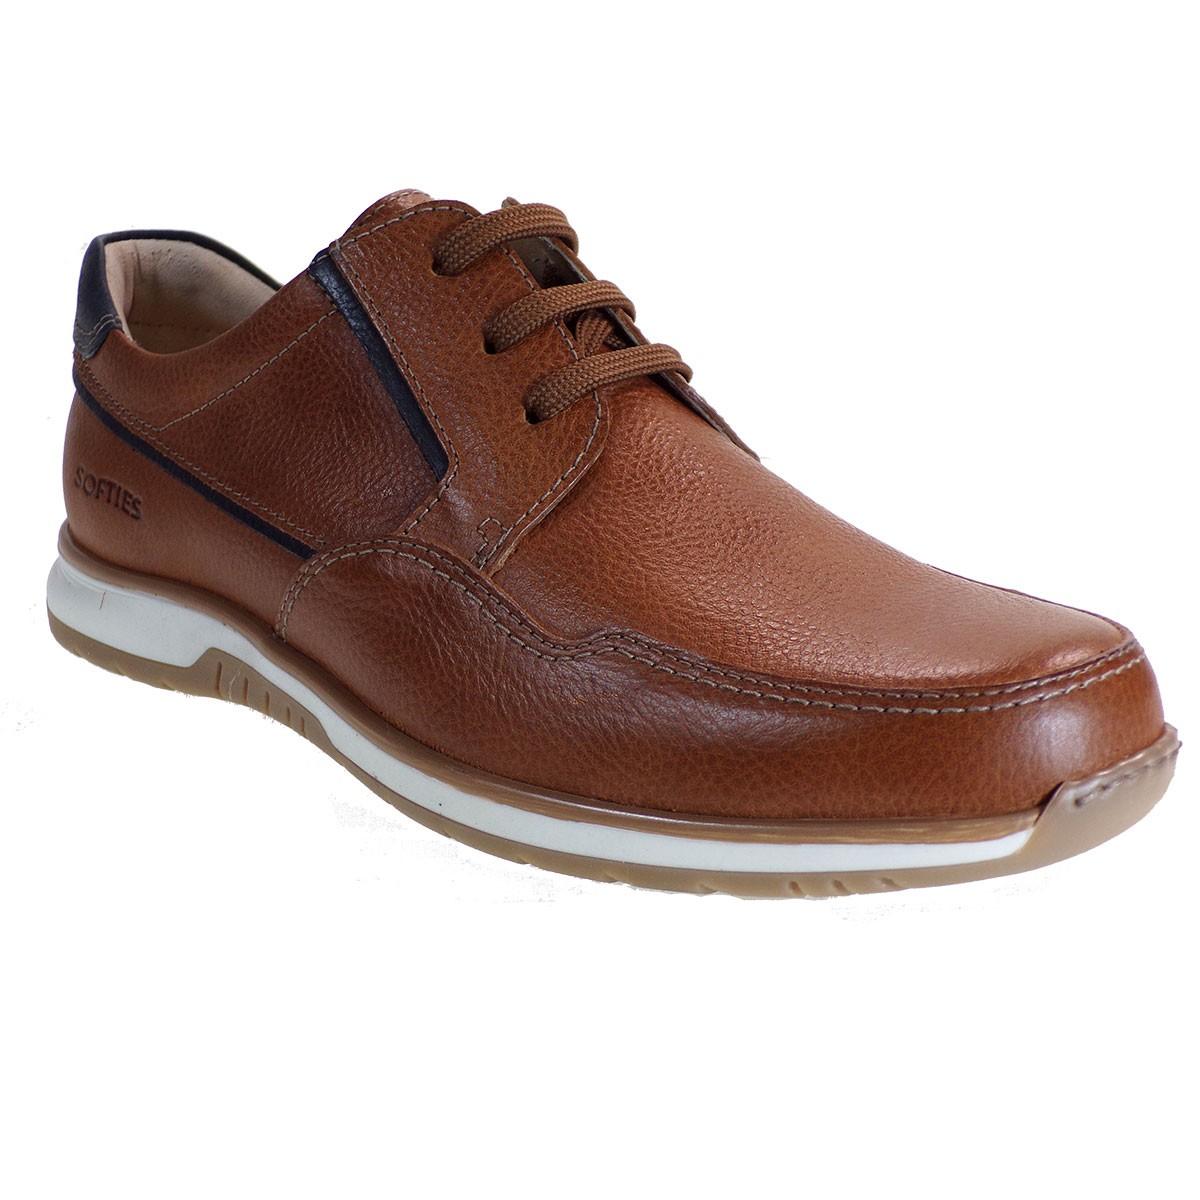 Softies Ανδρικά Παπούτσια 6112 Ταμπά Δέρμα